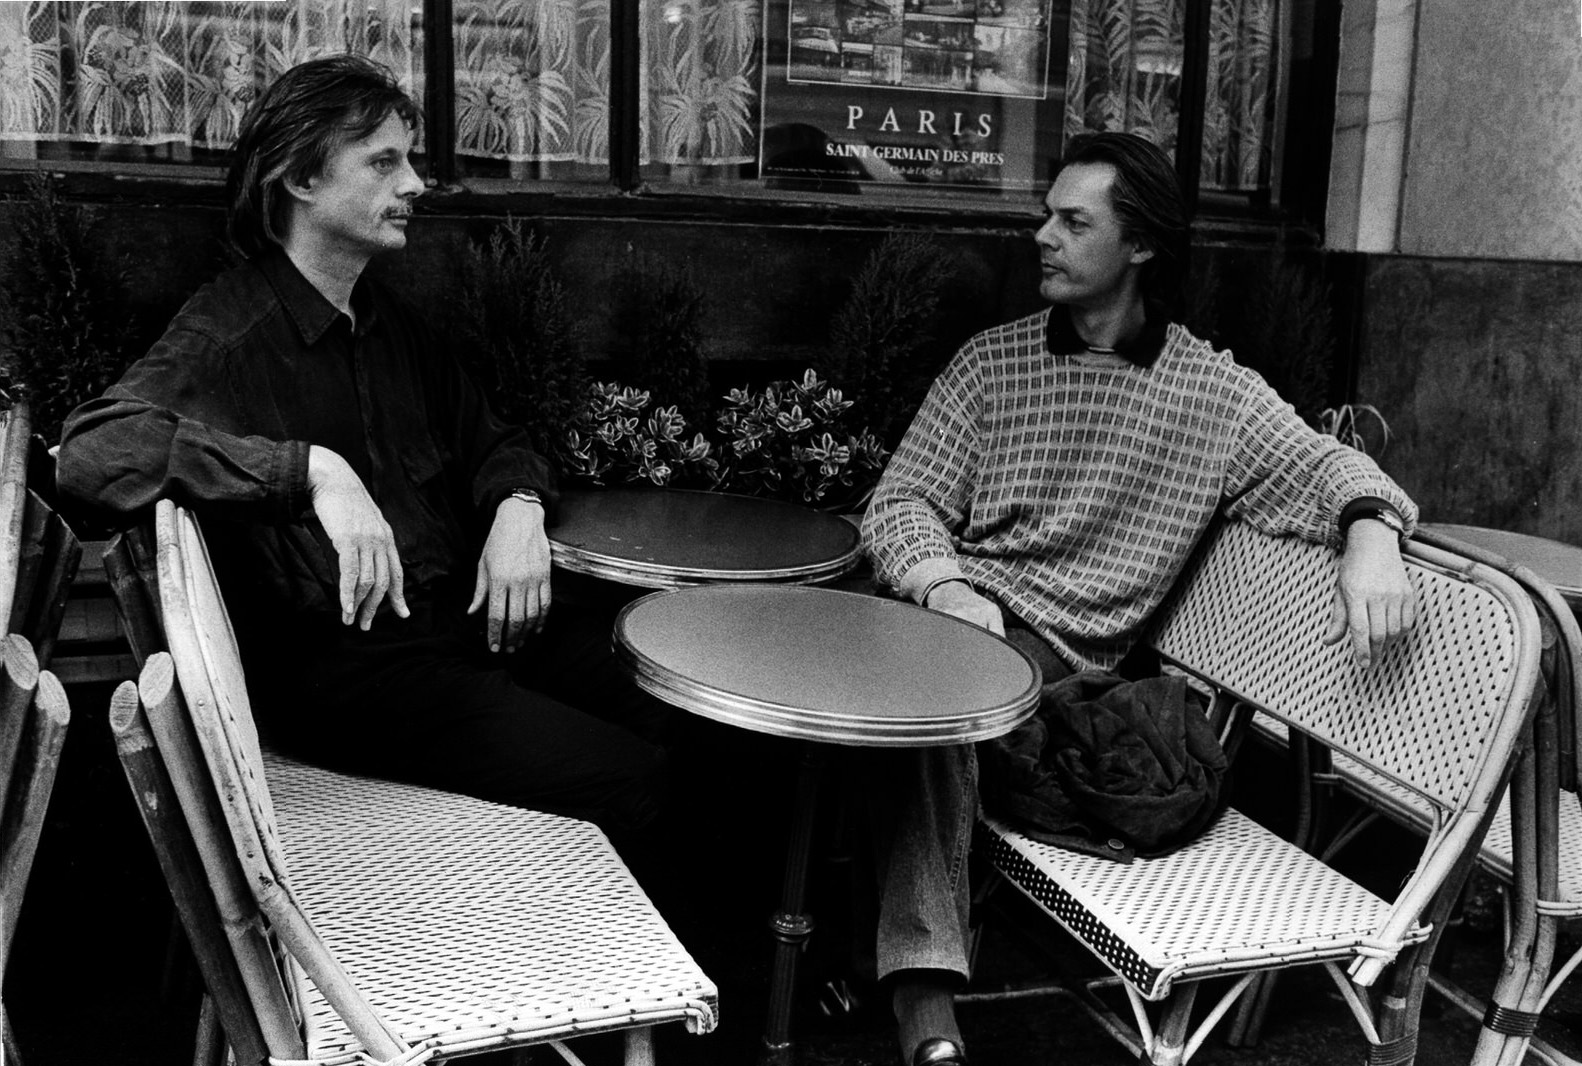 Manfred Eicher, Jan Gabarek im Café de Flore, Paris, 1980er • Foto © Christian Rose